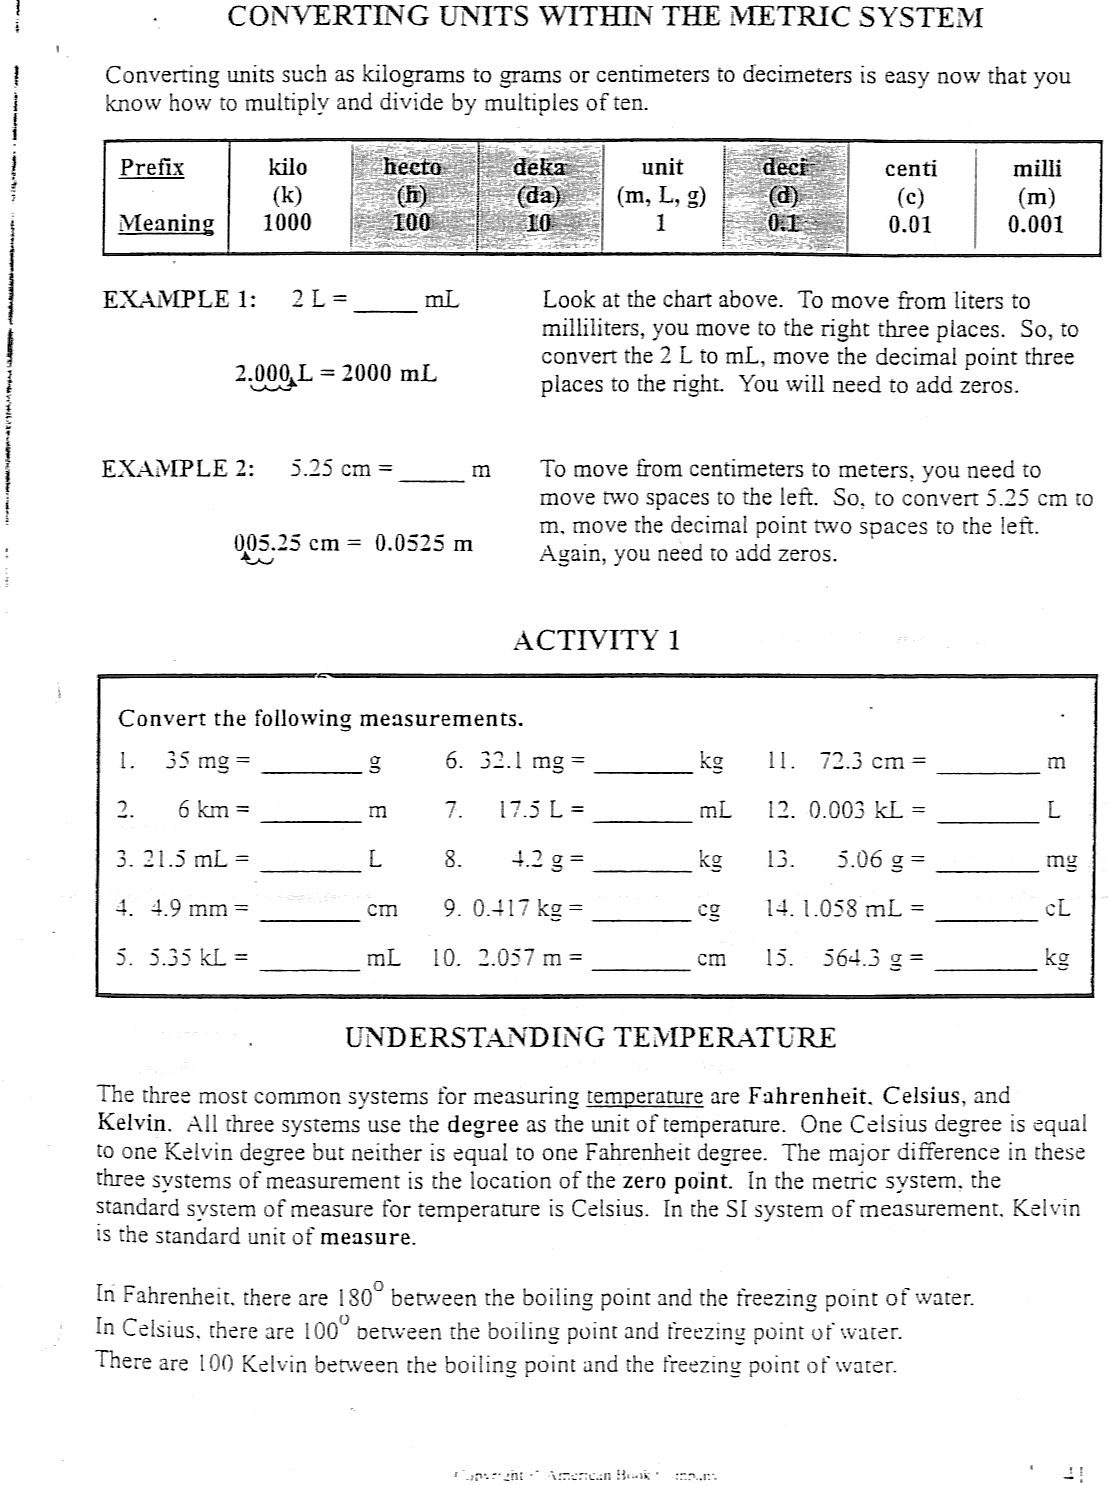 31 Metric System Review Worksheet